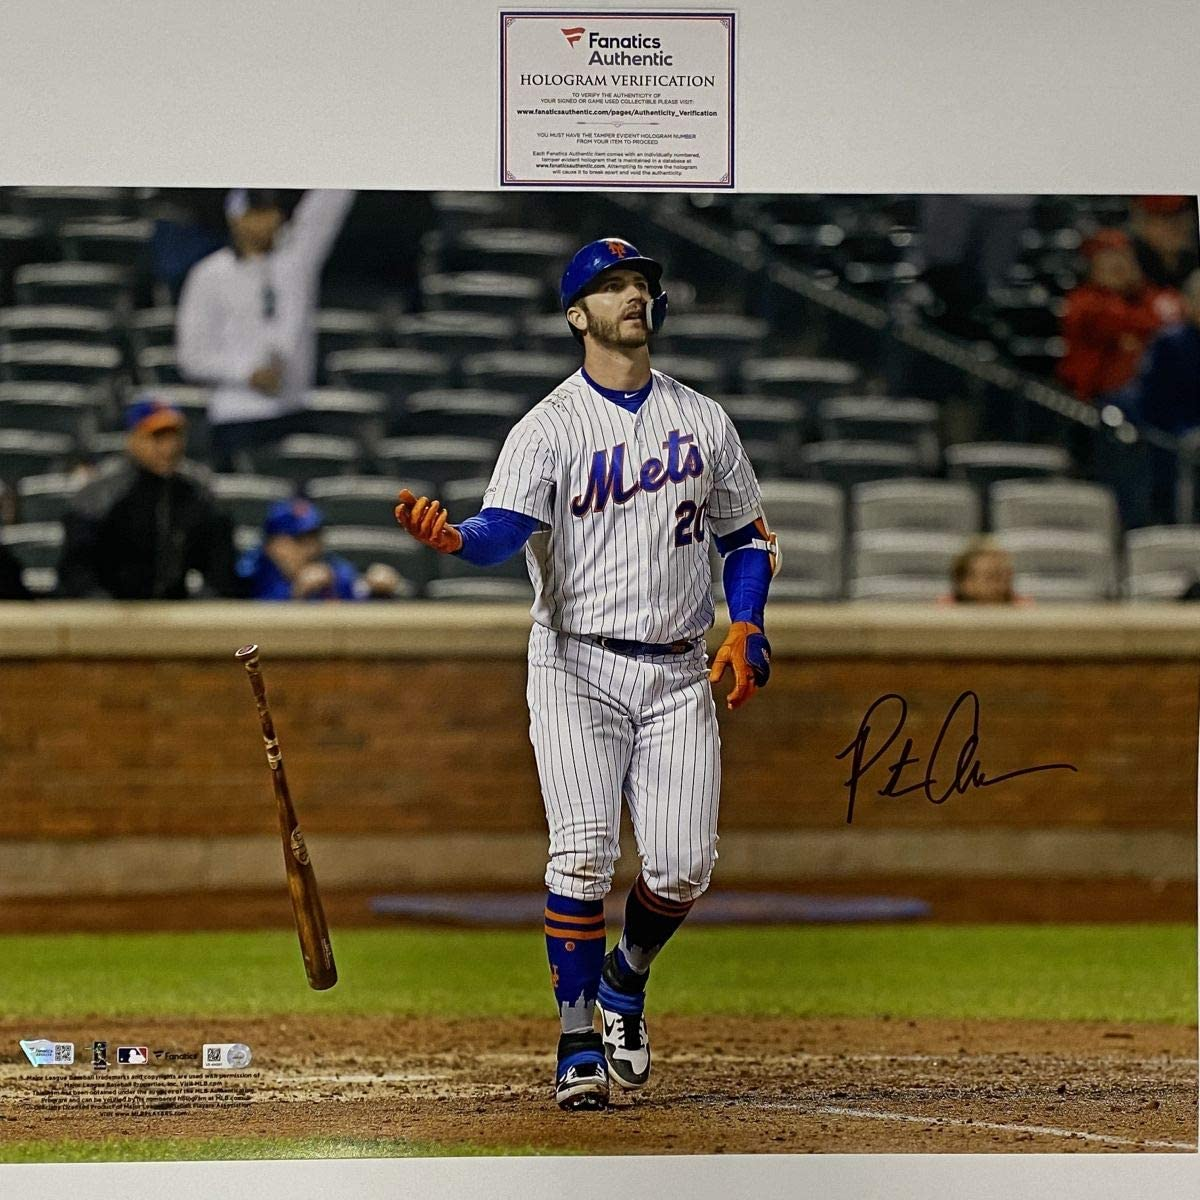 Autographed/Signed Pete Alonso New York Mets 16x20 Baseball Photo Fanatics COA